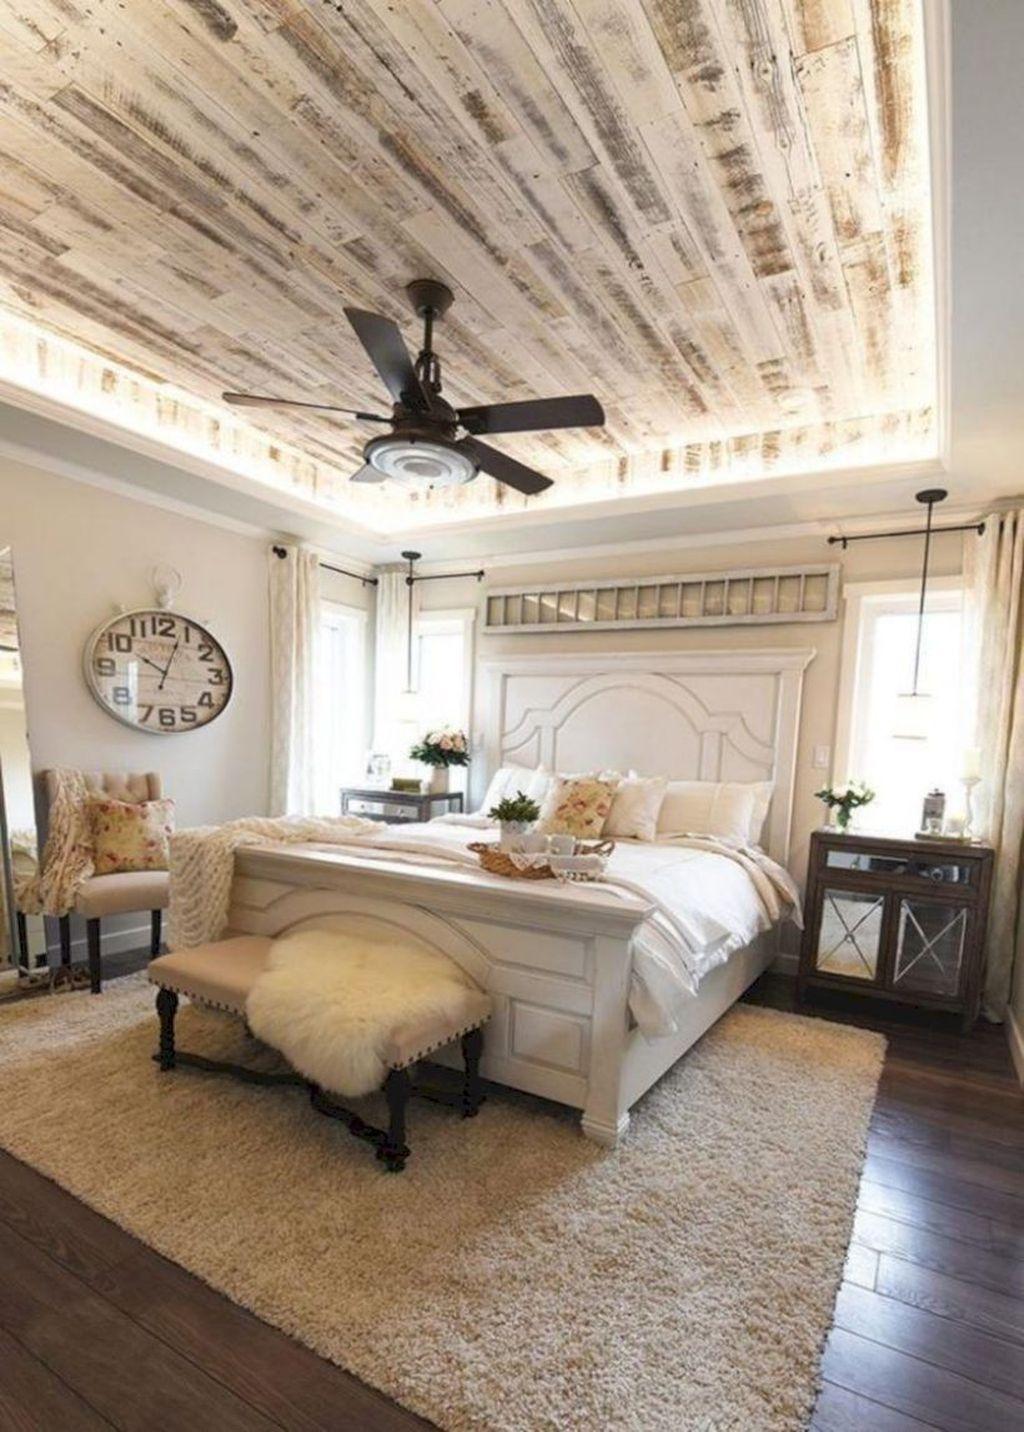 Stunning Farmhouse Interior Design Ideas To Realize Your Dreams 24